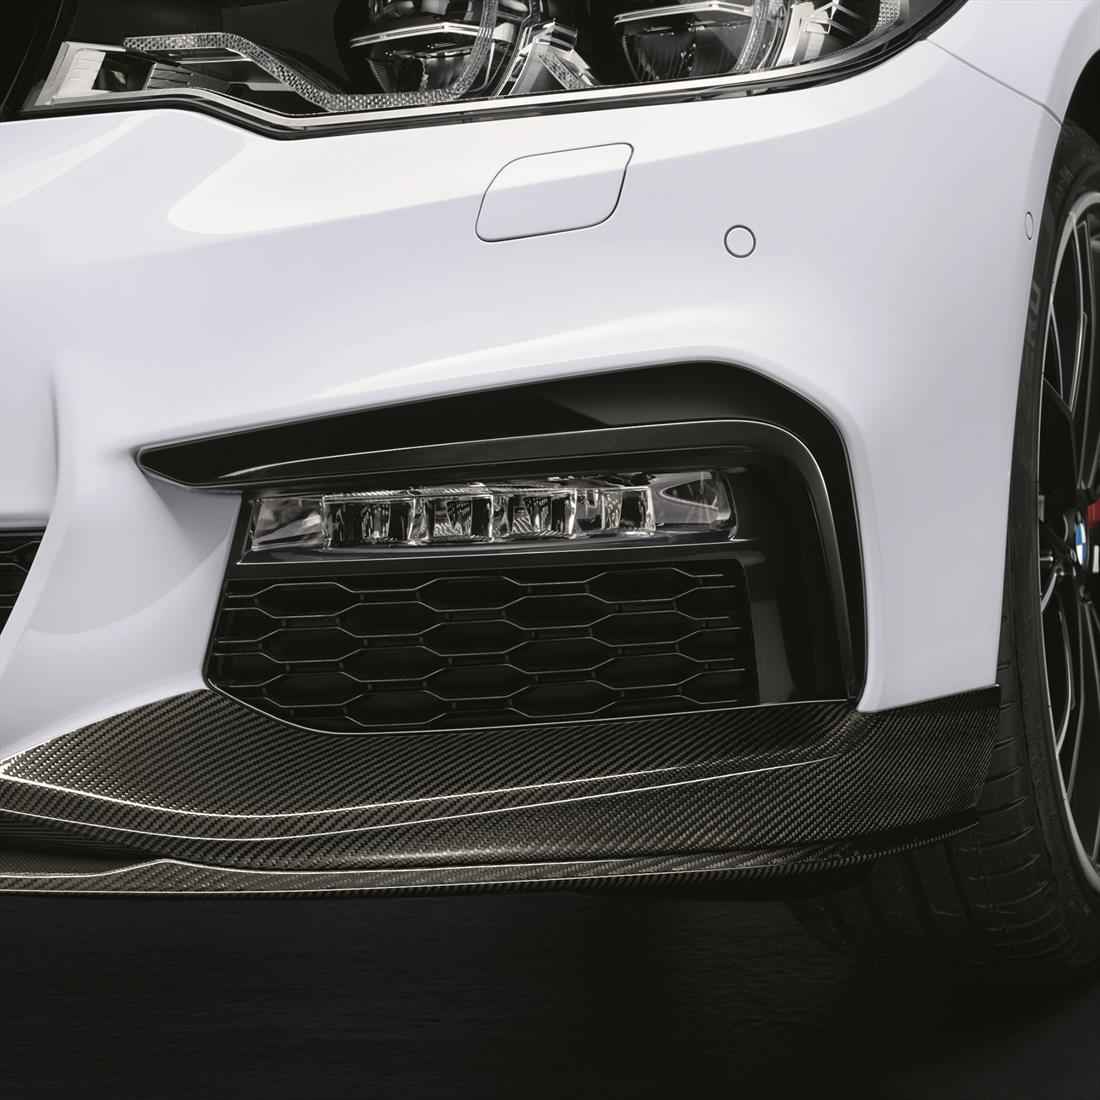 BMW Bumper Trims in High Gloss Black